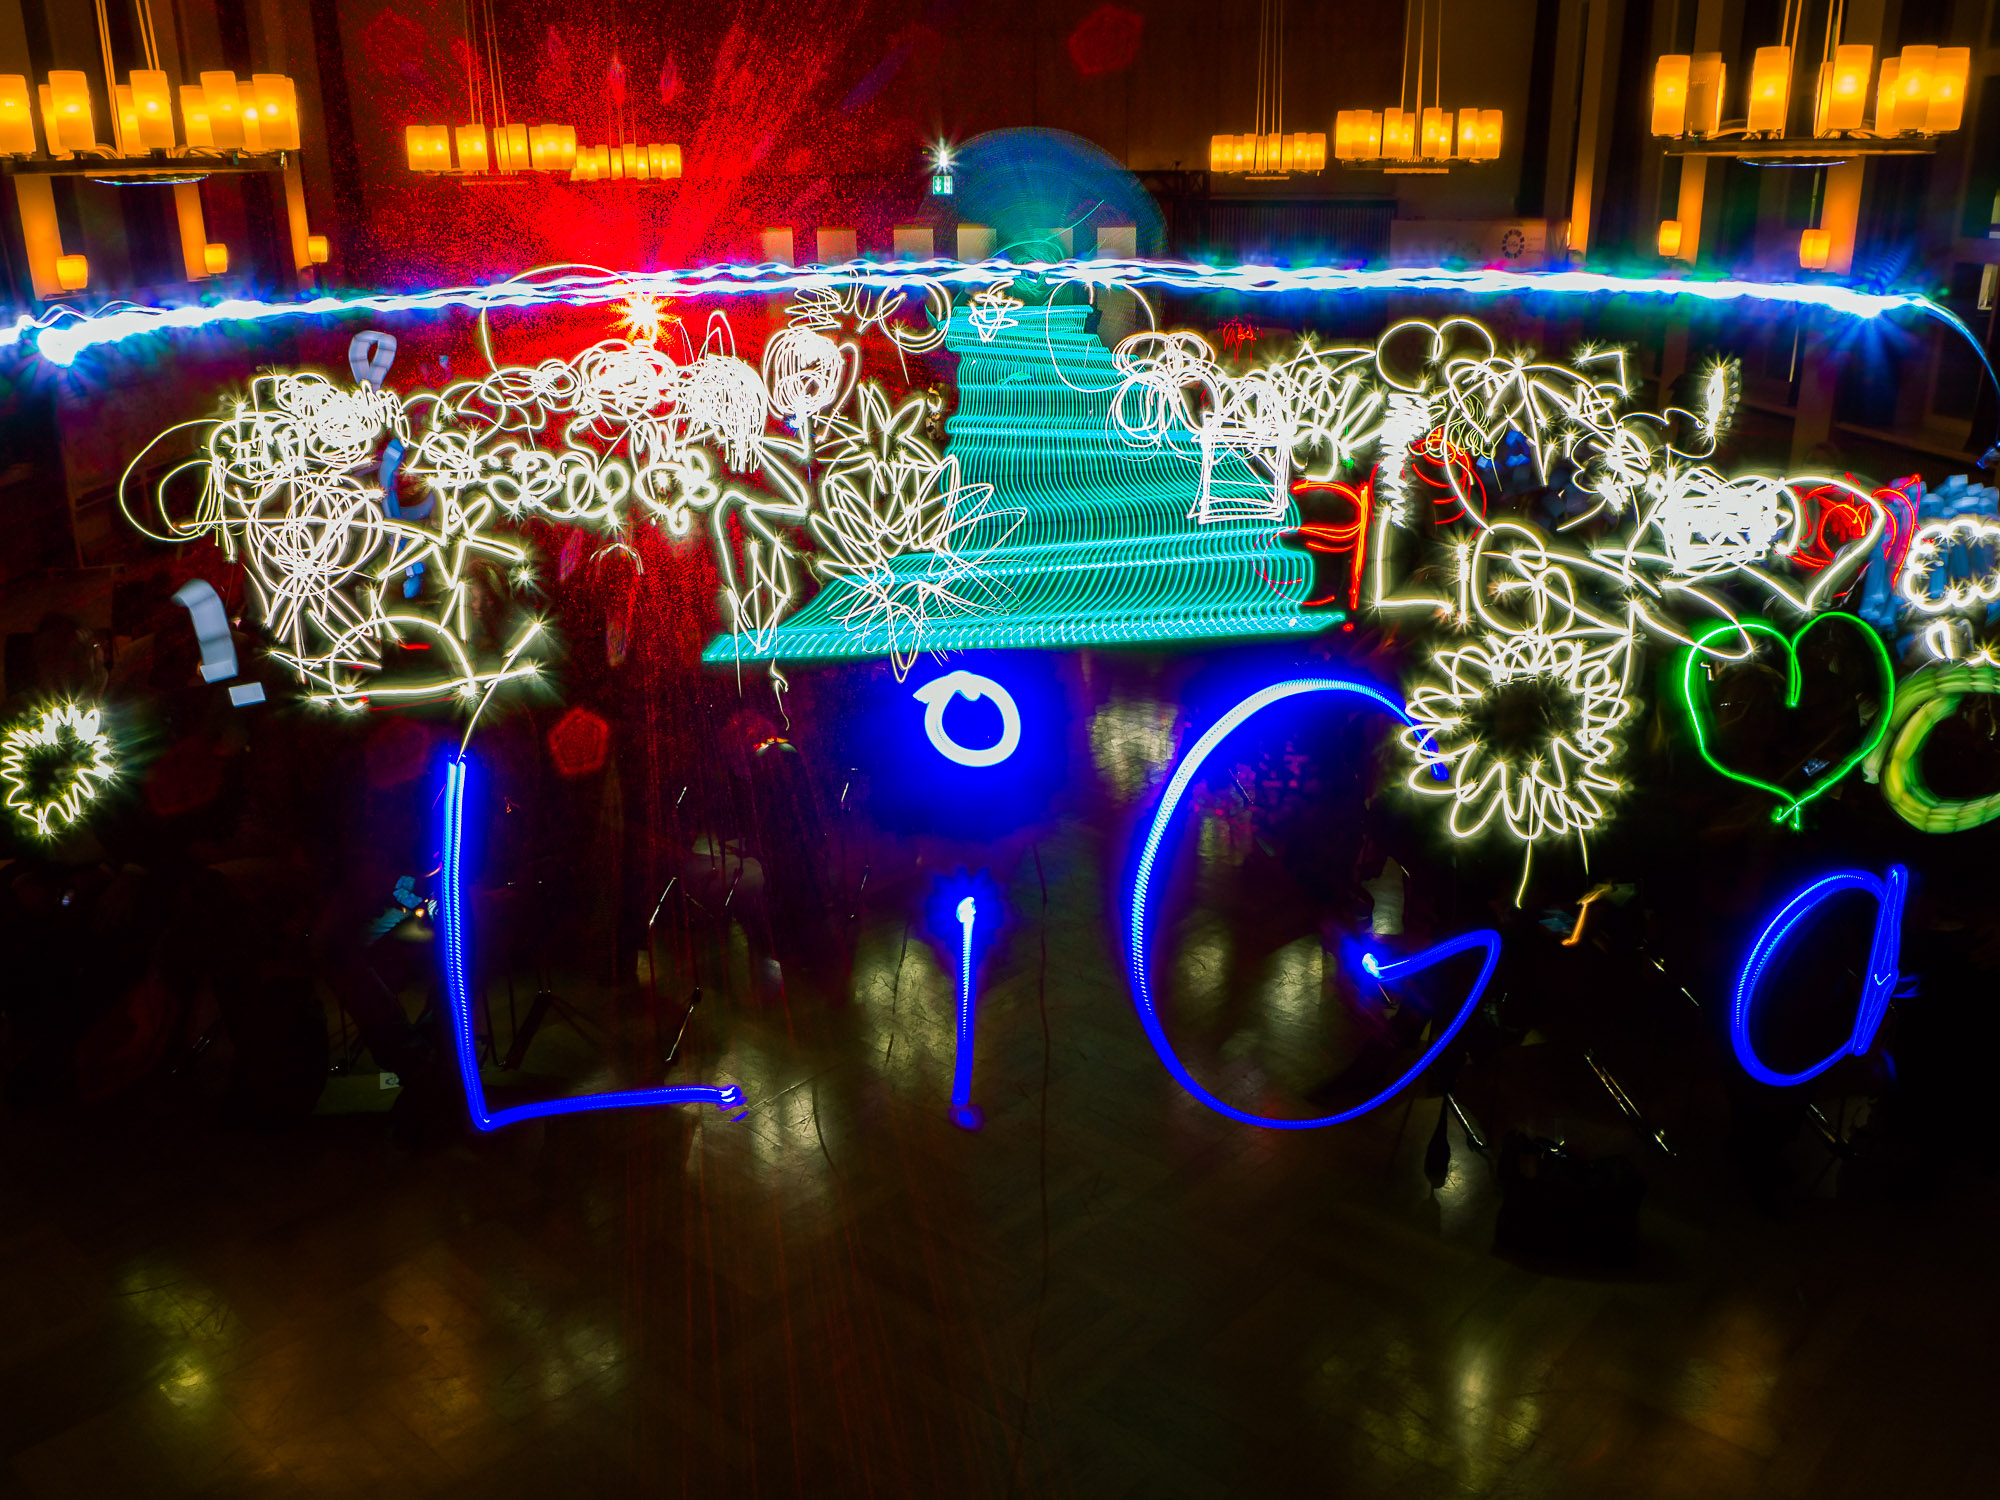 LiGa - Lernen im Ganztag - Lightpainting Ulrich Tausend (1000lights.de)